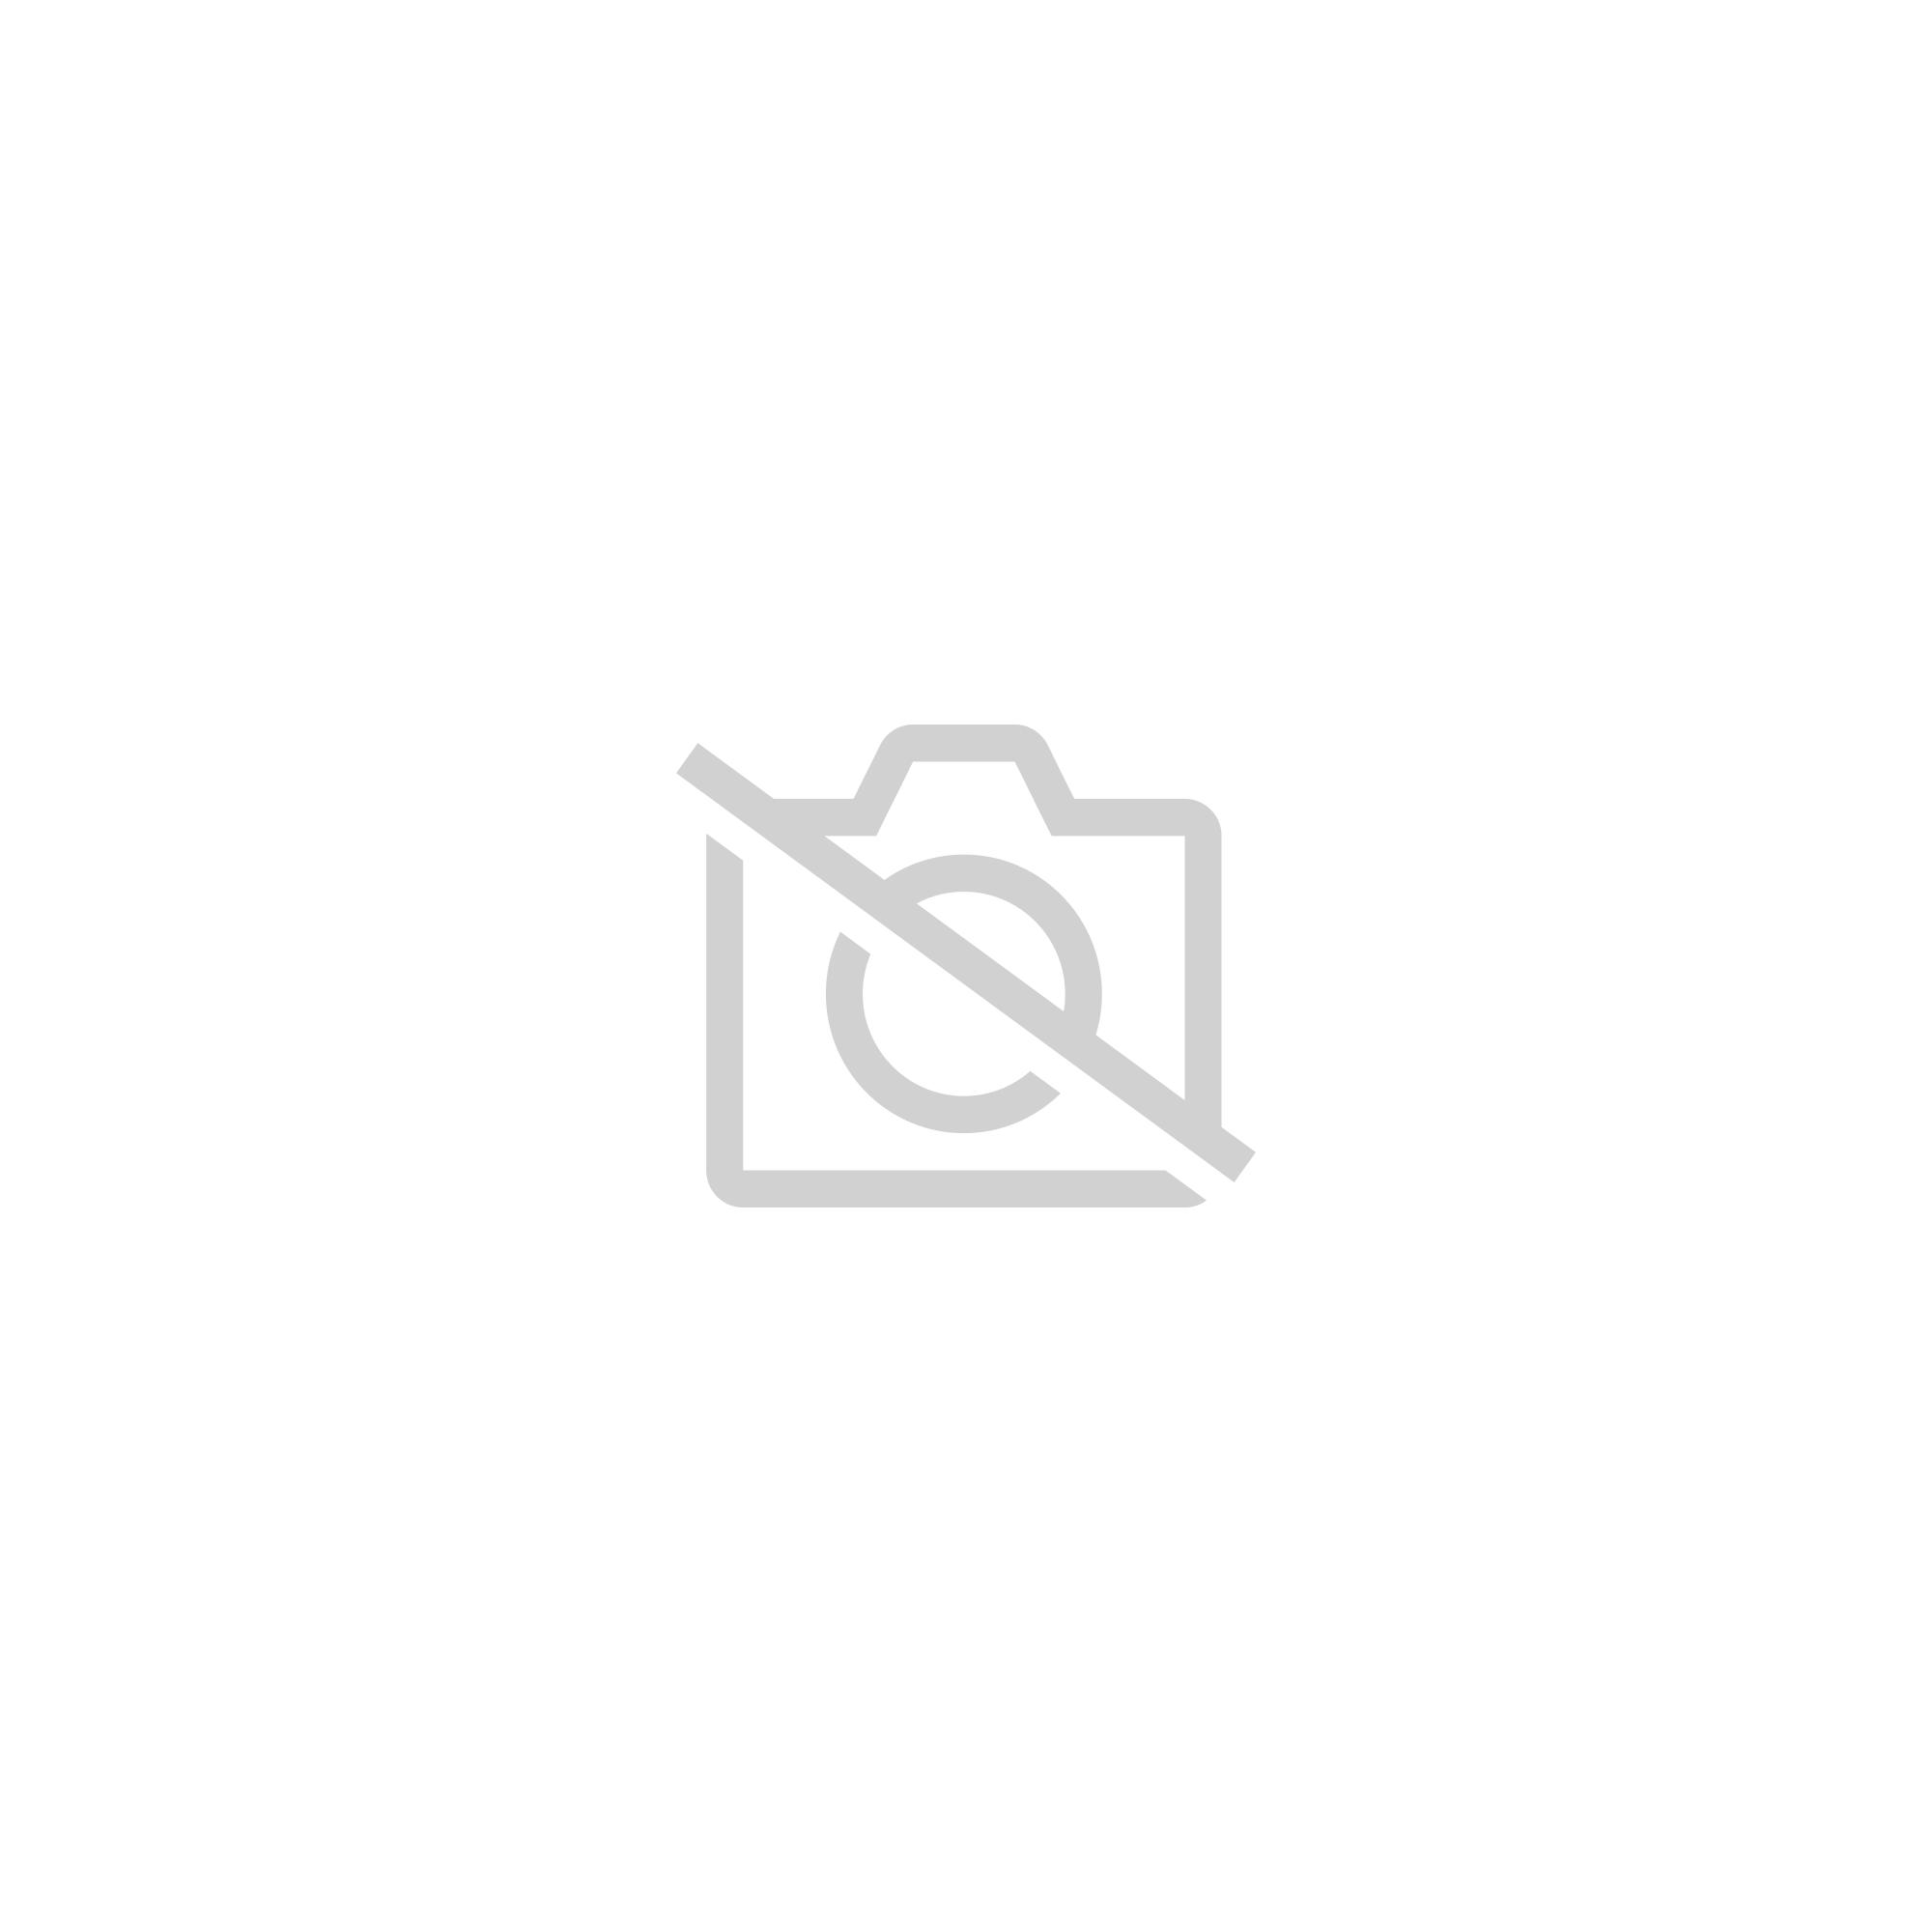 Pokemon Tcg Sleeves Protege Cartes Volcanion 2016 (32 Sleeves)